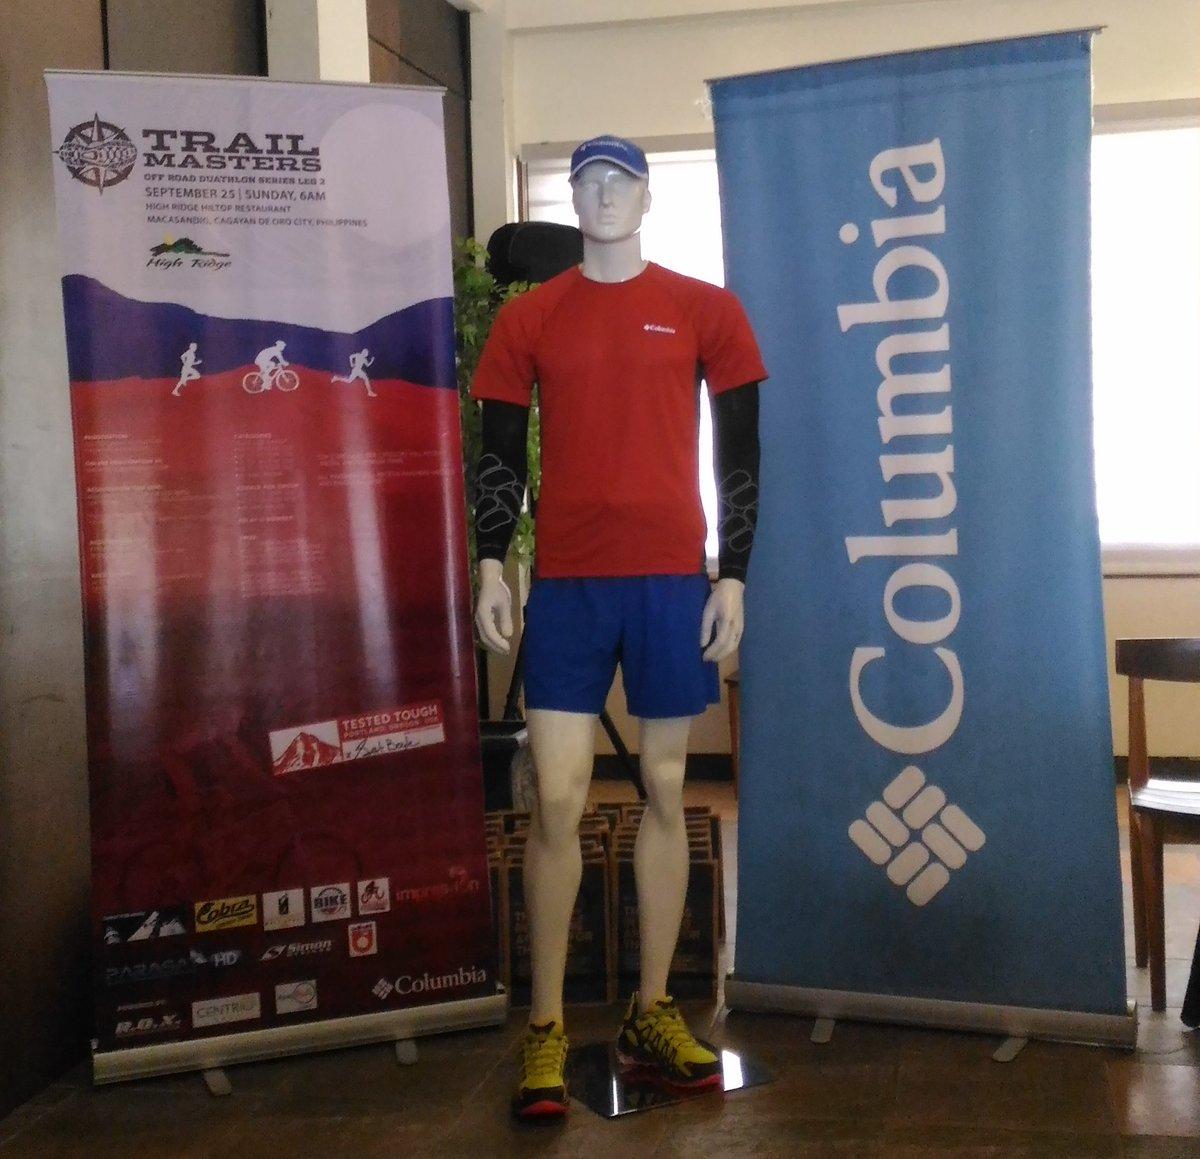 trailer-master-cdo-columbia-sportswear